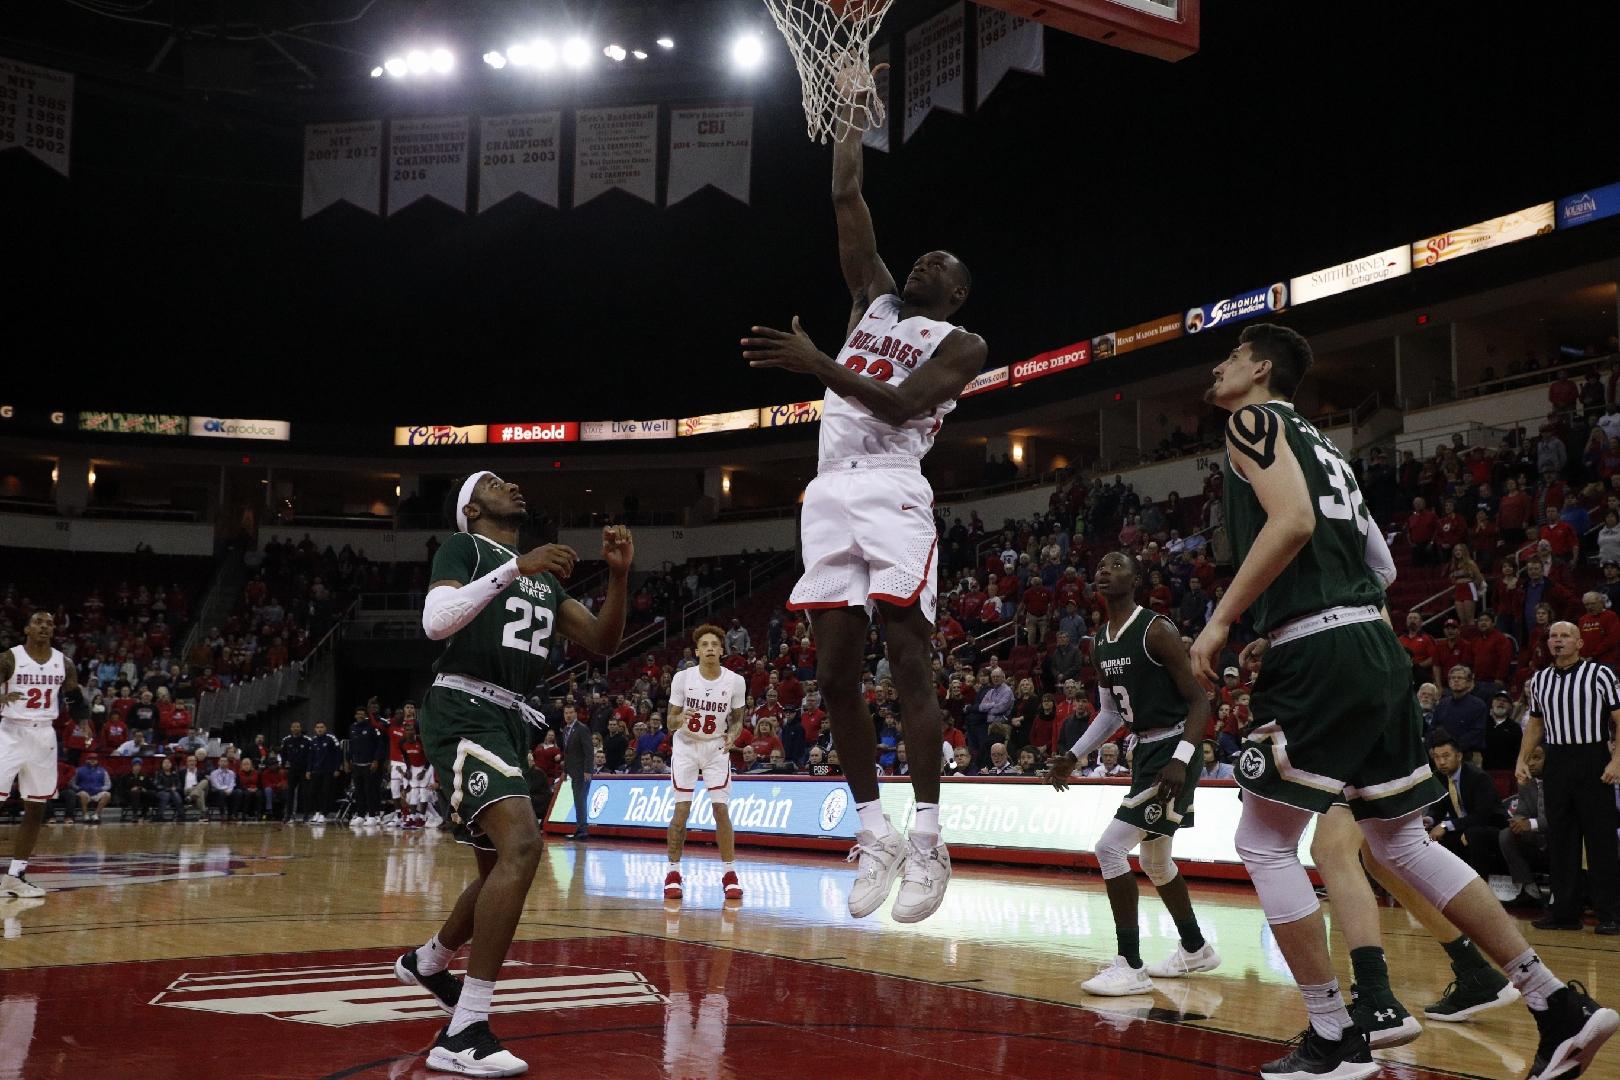 Photo of Fresno State basketball player Nate Grimes